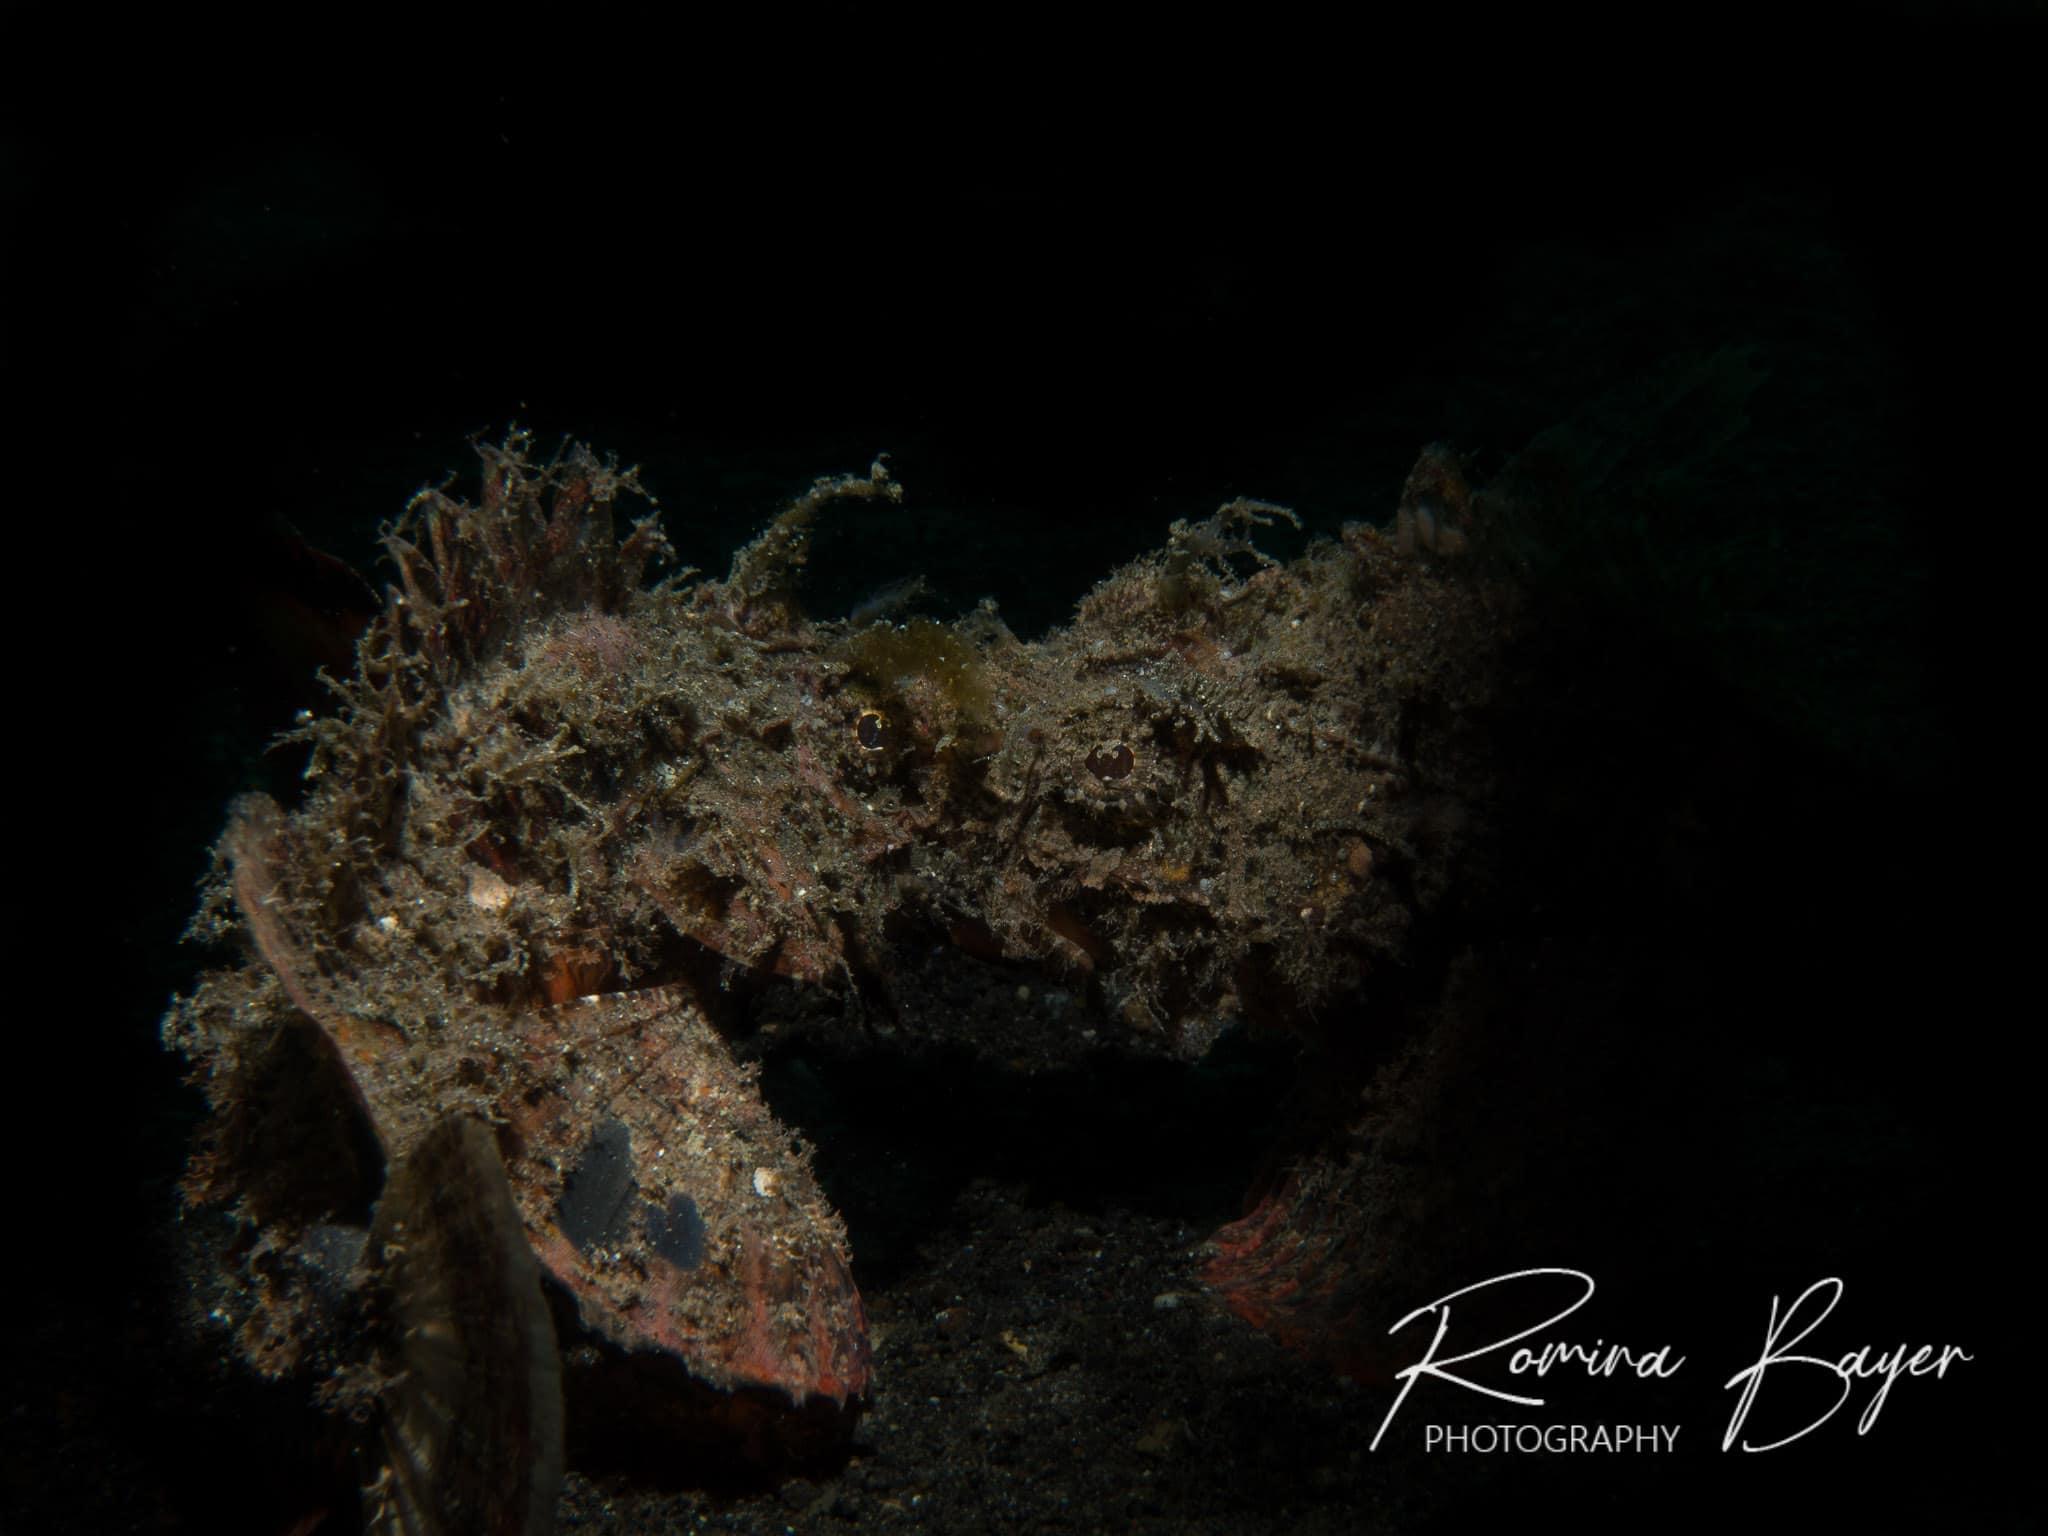 Two scorpionfish fighting